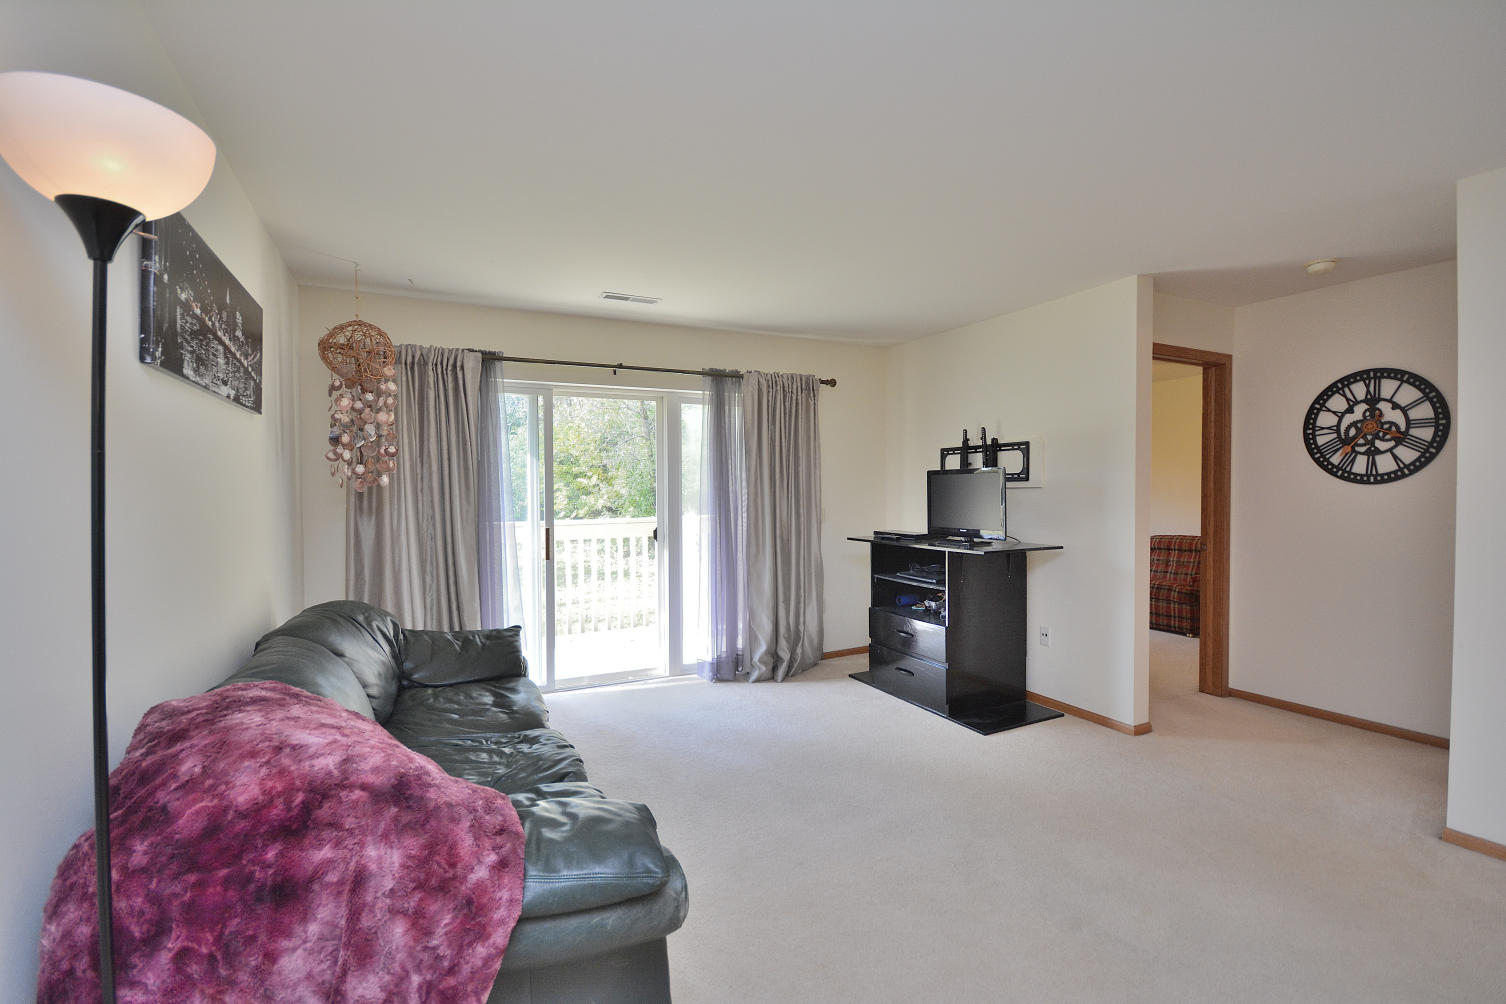 530 Windstone Dr, Hartland, Wisconsin 53029, 2 Bedrooms Bedrooms, 5 Rooms Rooms,2 BathroomsBathrooms,Condominiums,For Sale,Windstone Dr,2,1664294